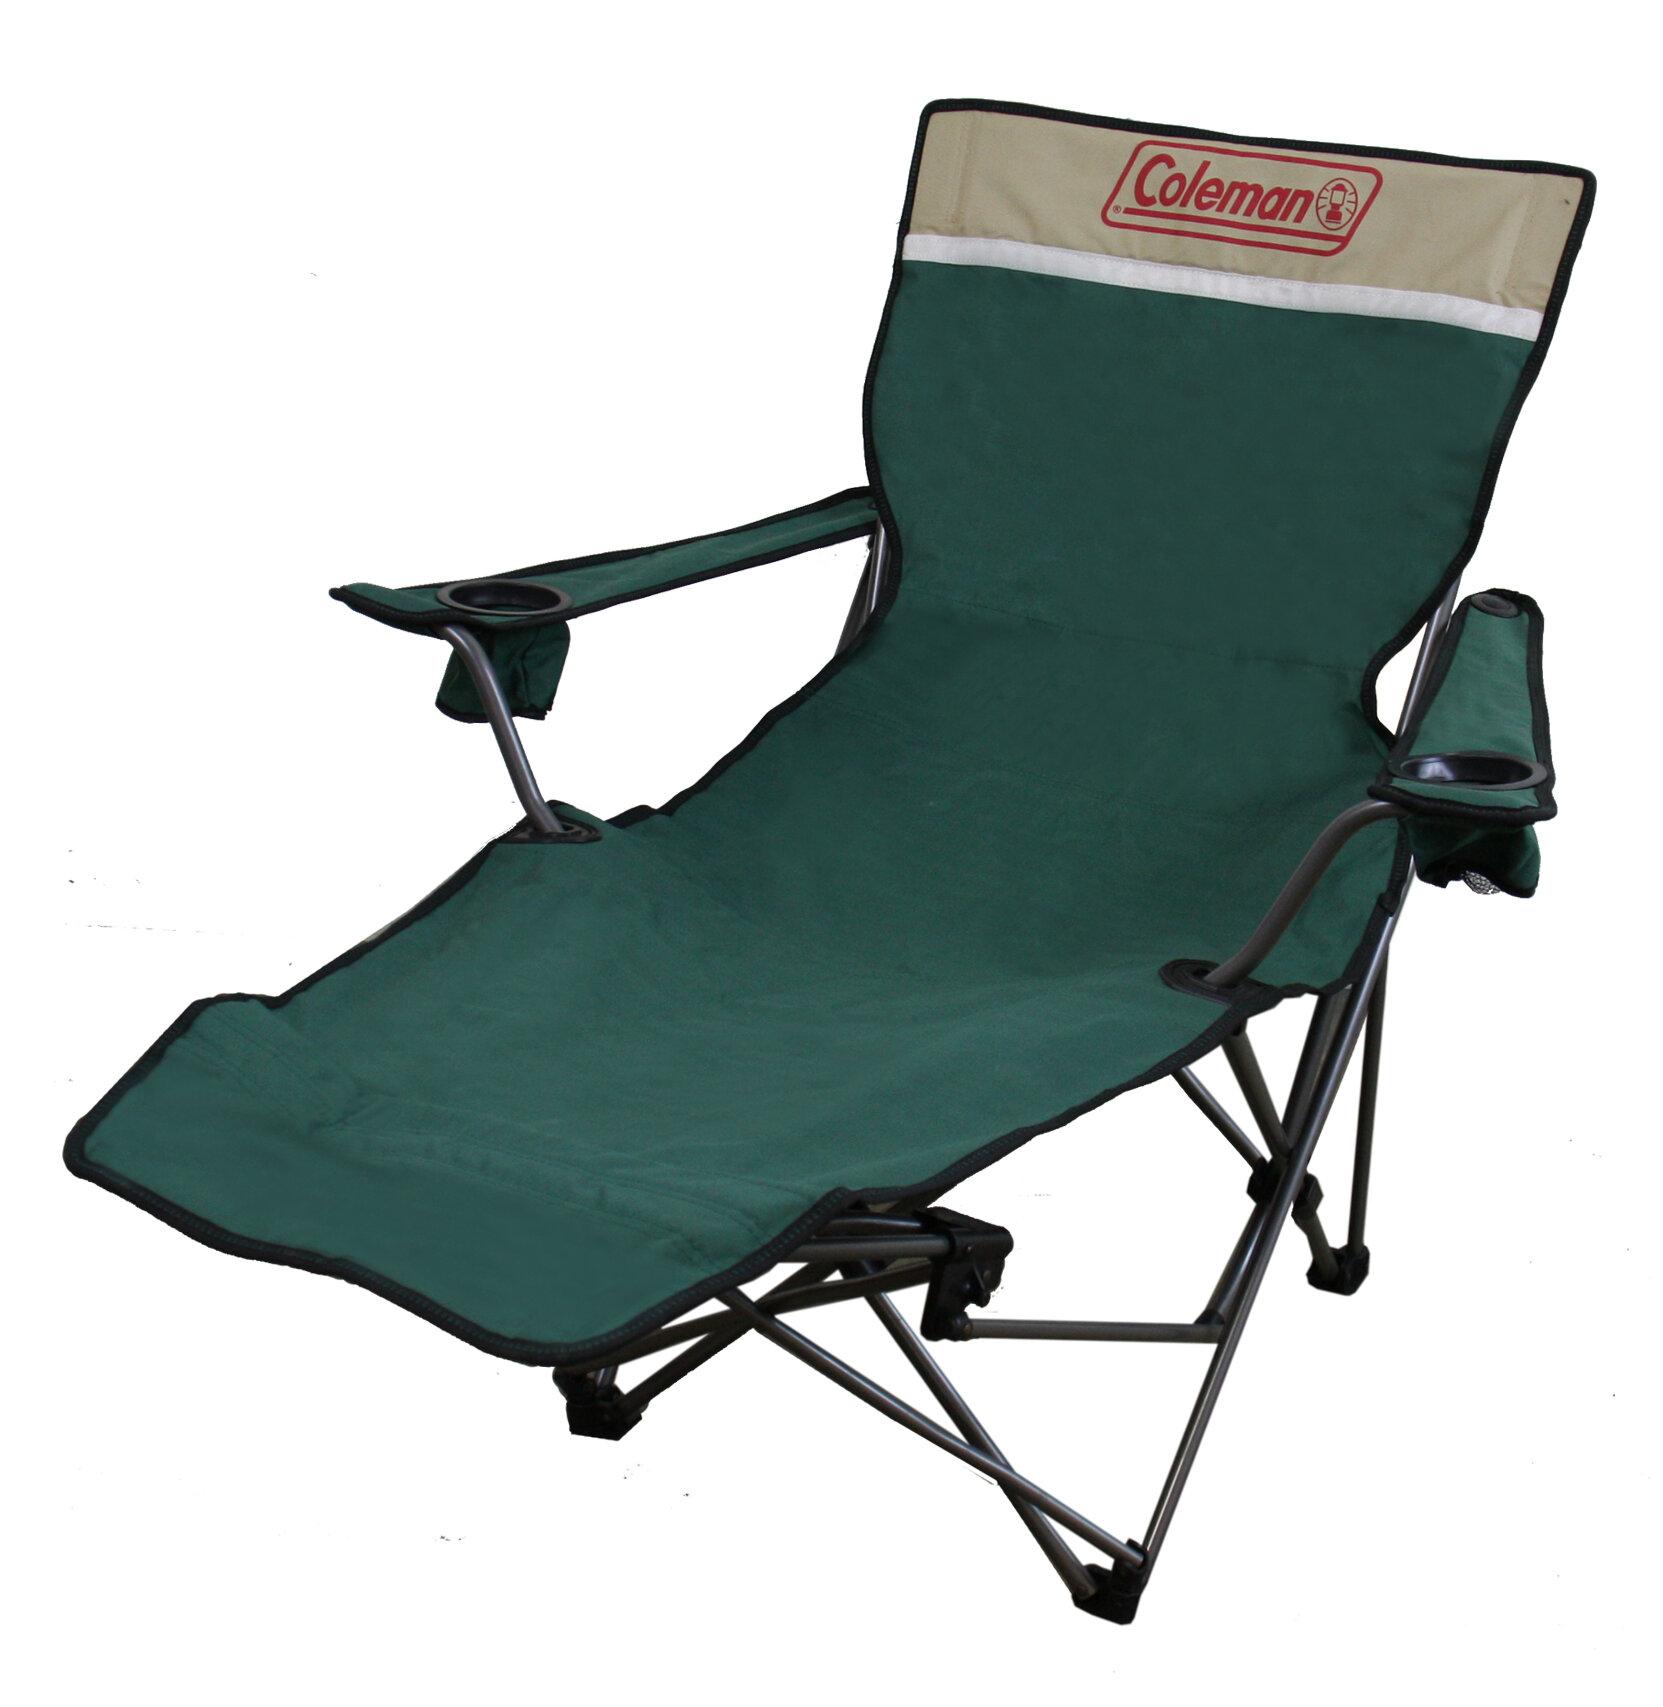 Astounding Portable Lounge Reclining Camping Chair With Cushion Creativecarmelina Interior Chair Design Creativecarmelinacom